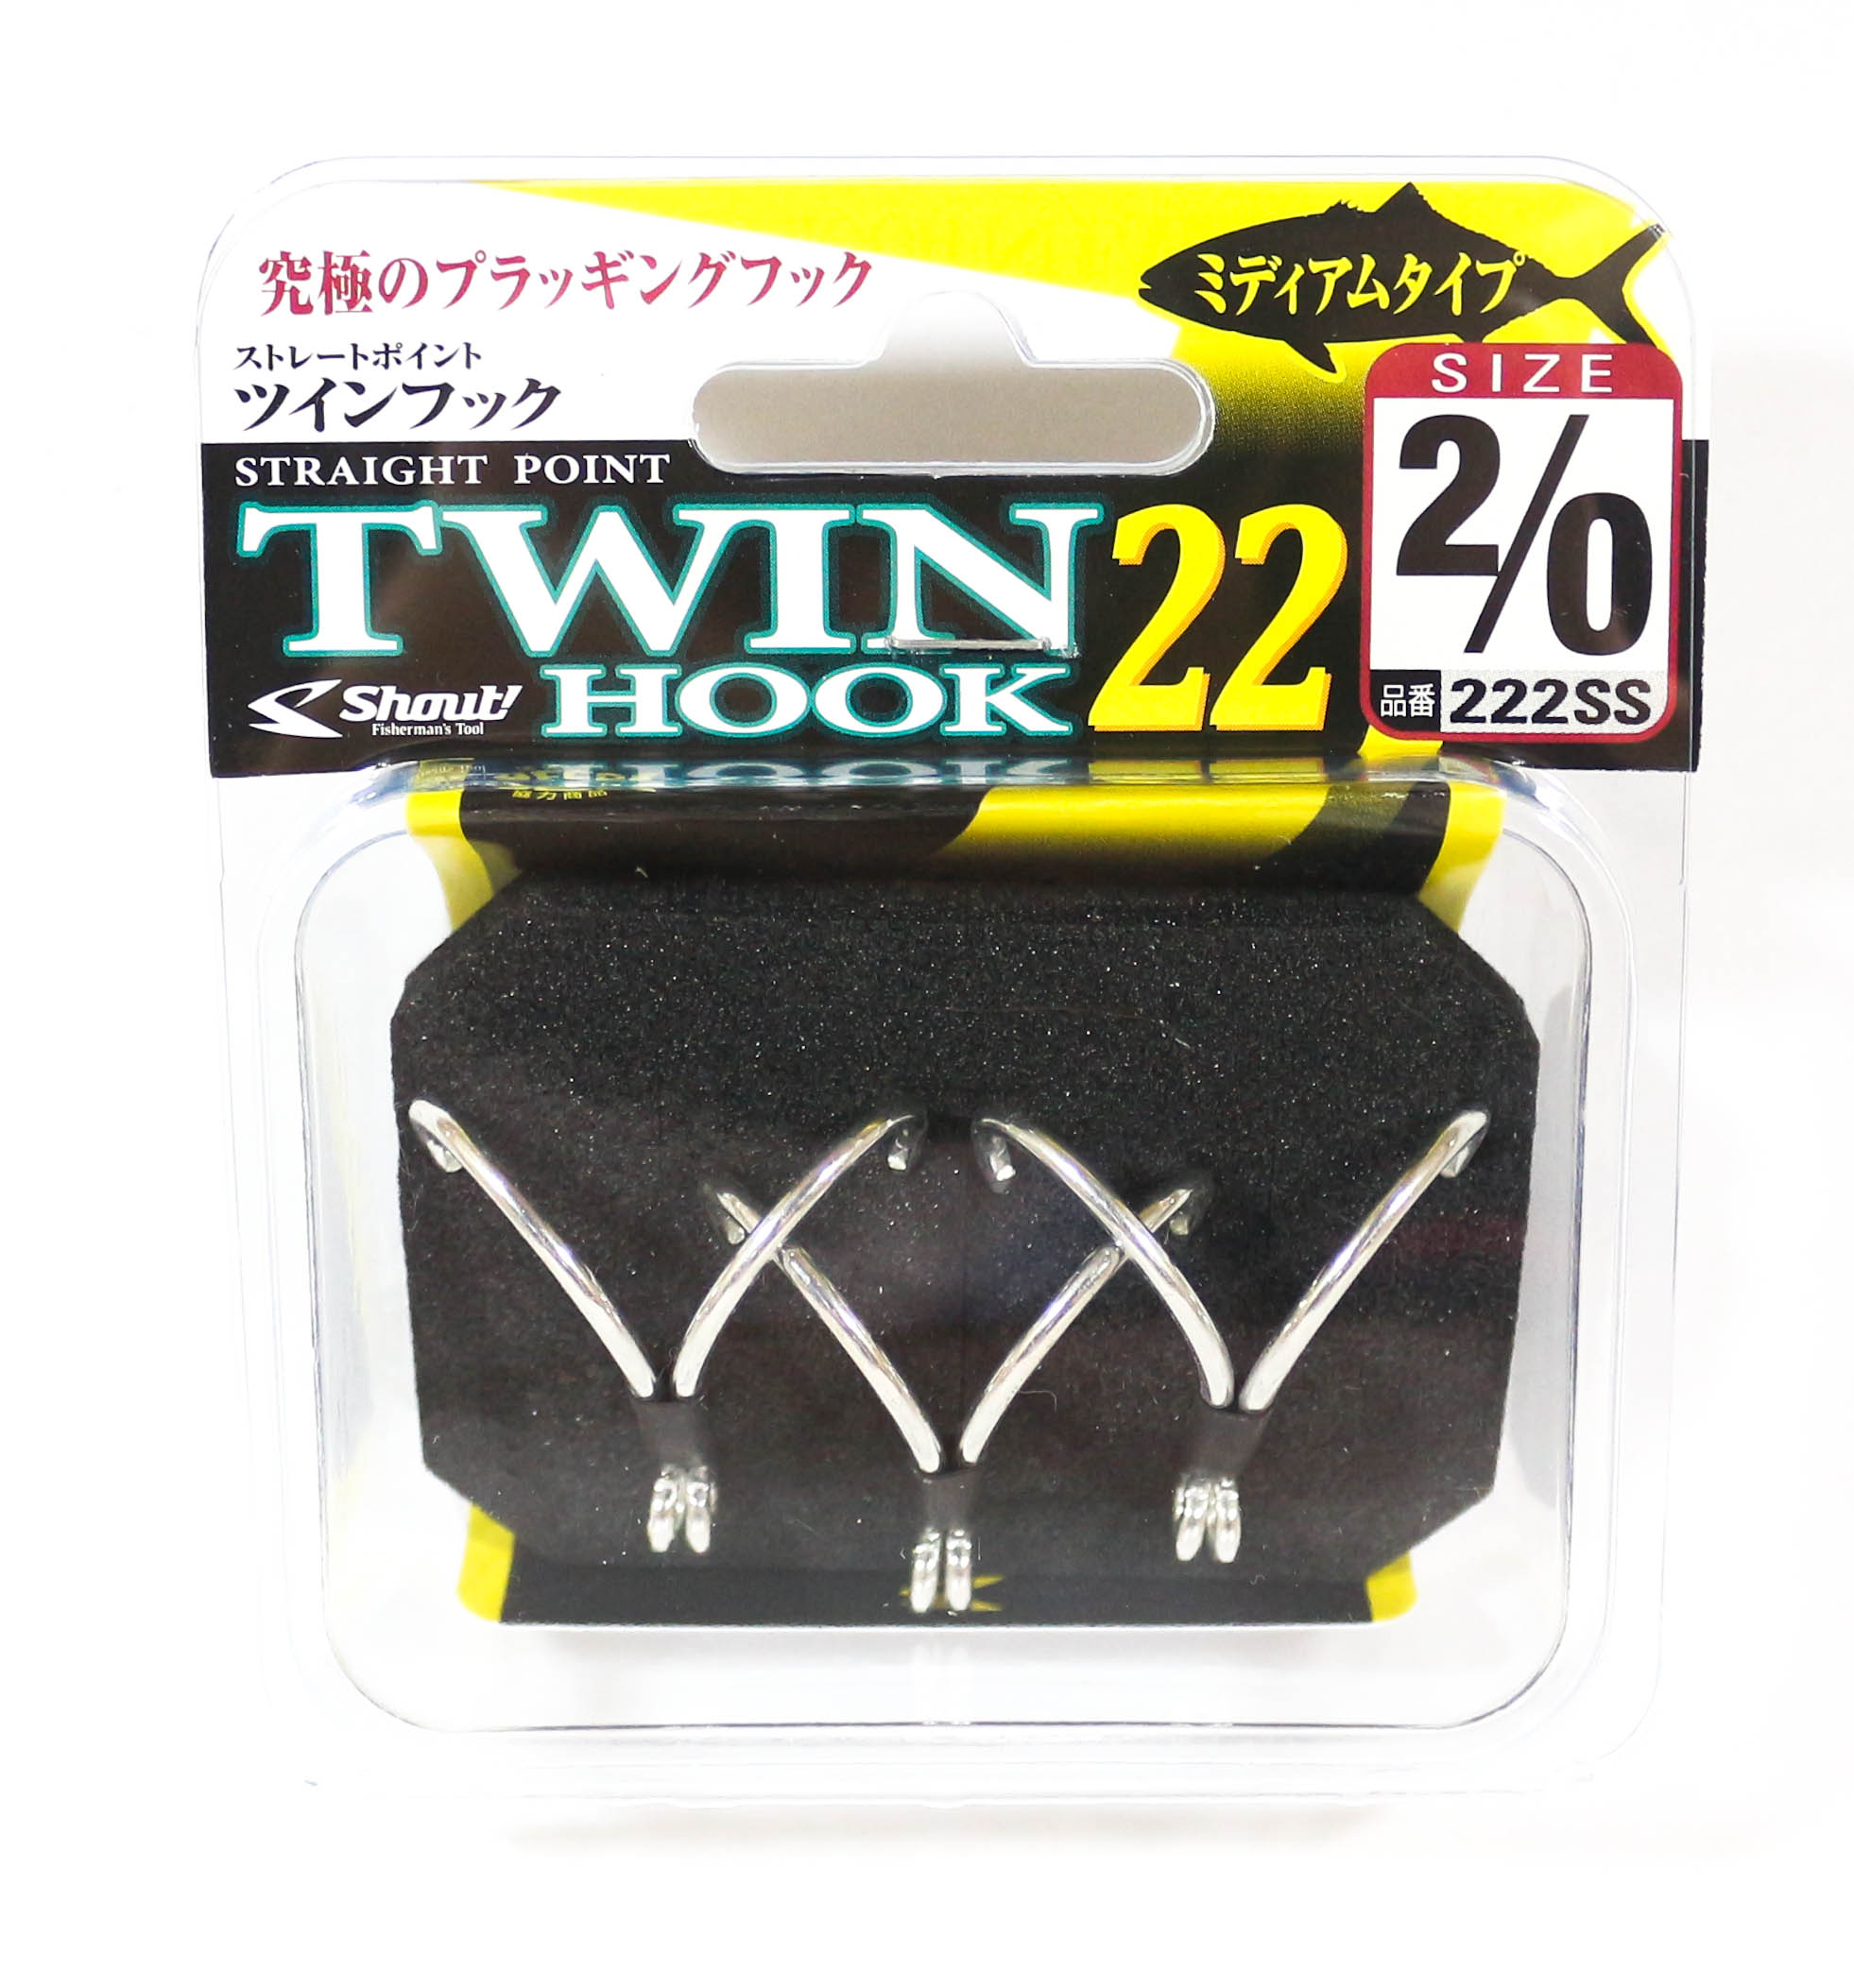 Shout 222-SS ST Point Twin Hook Double Hook Size 2/0 (8419)